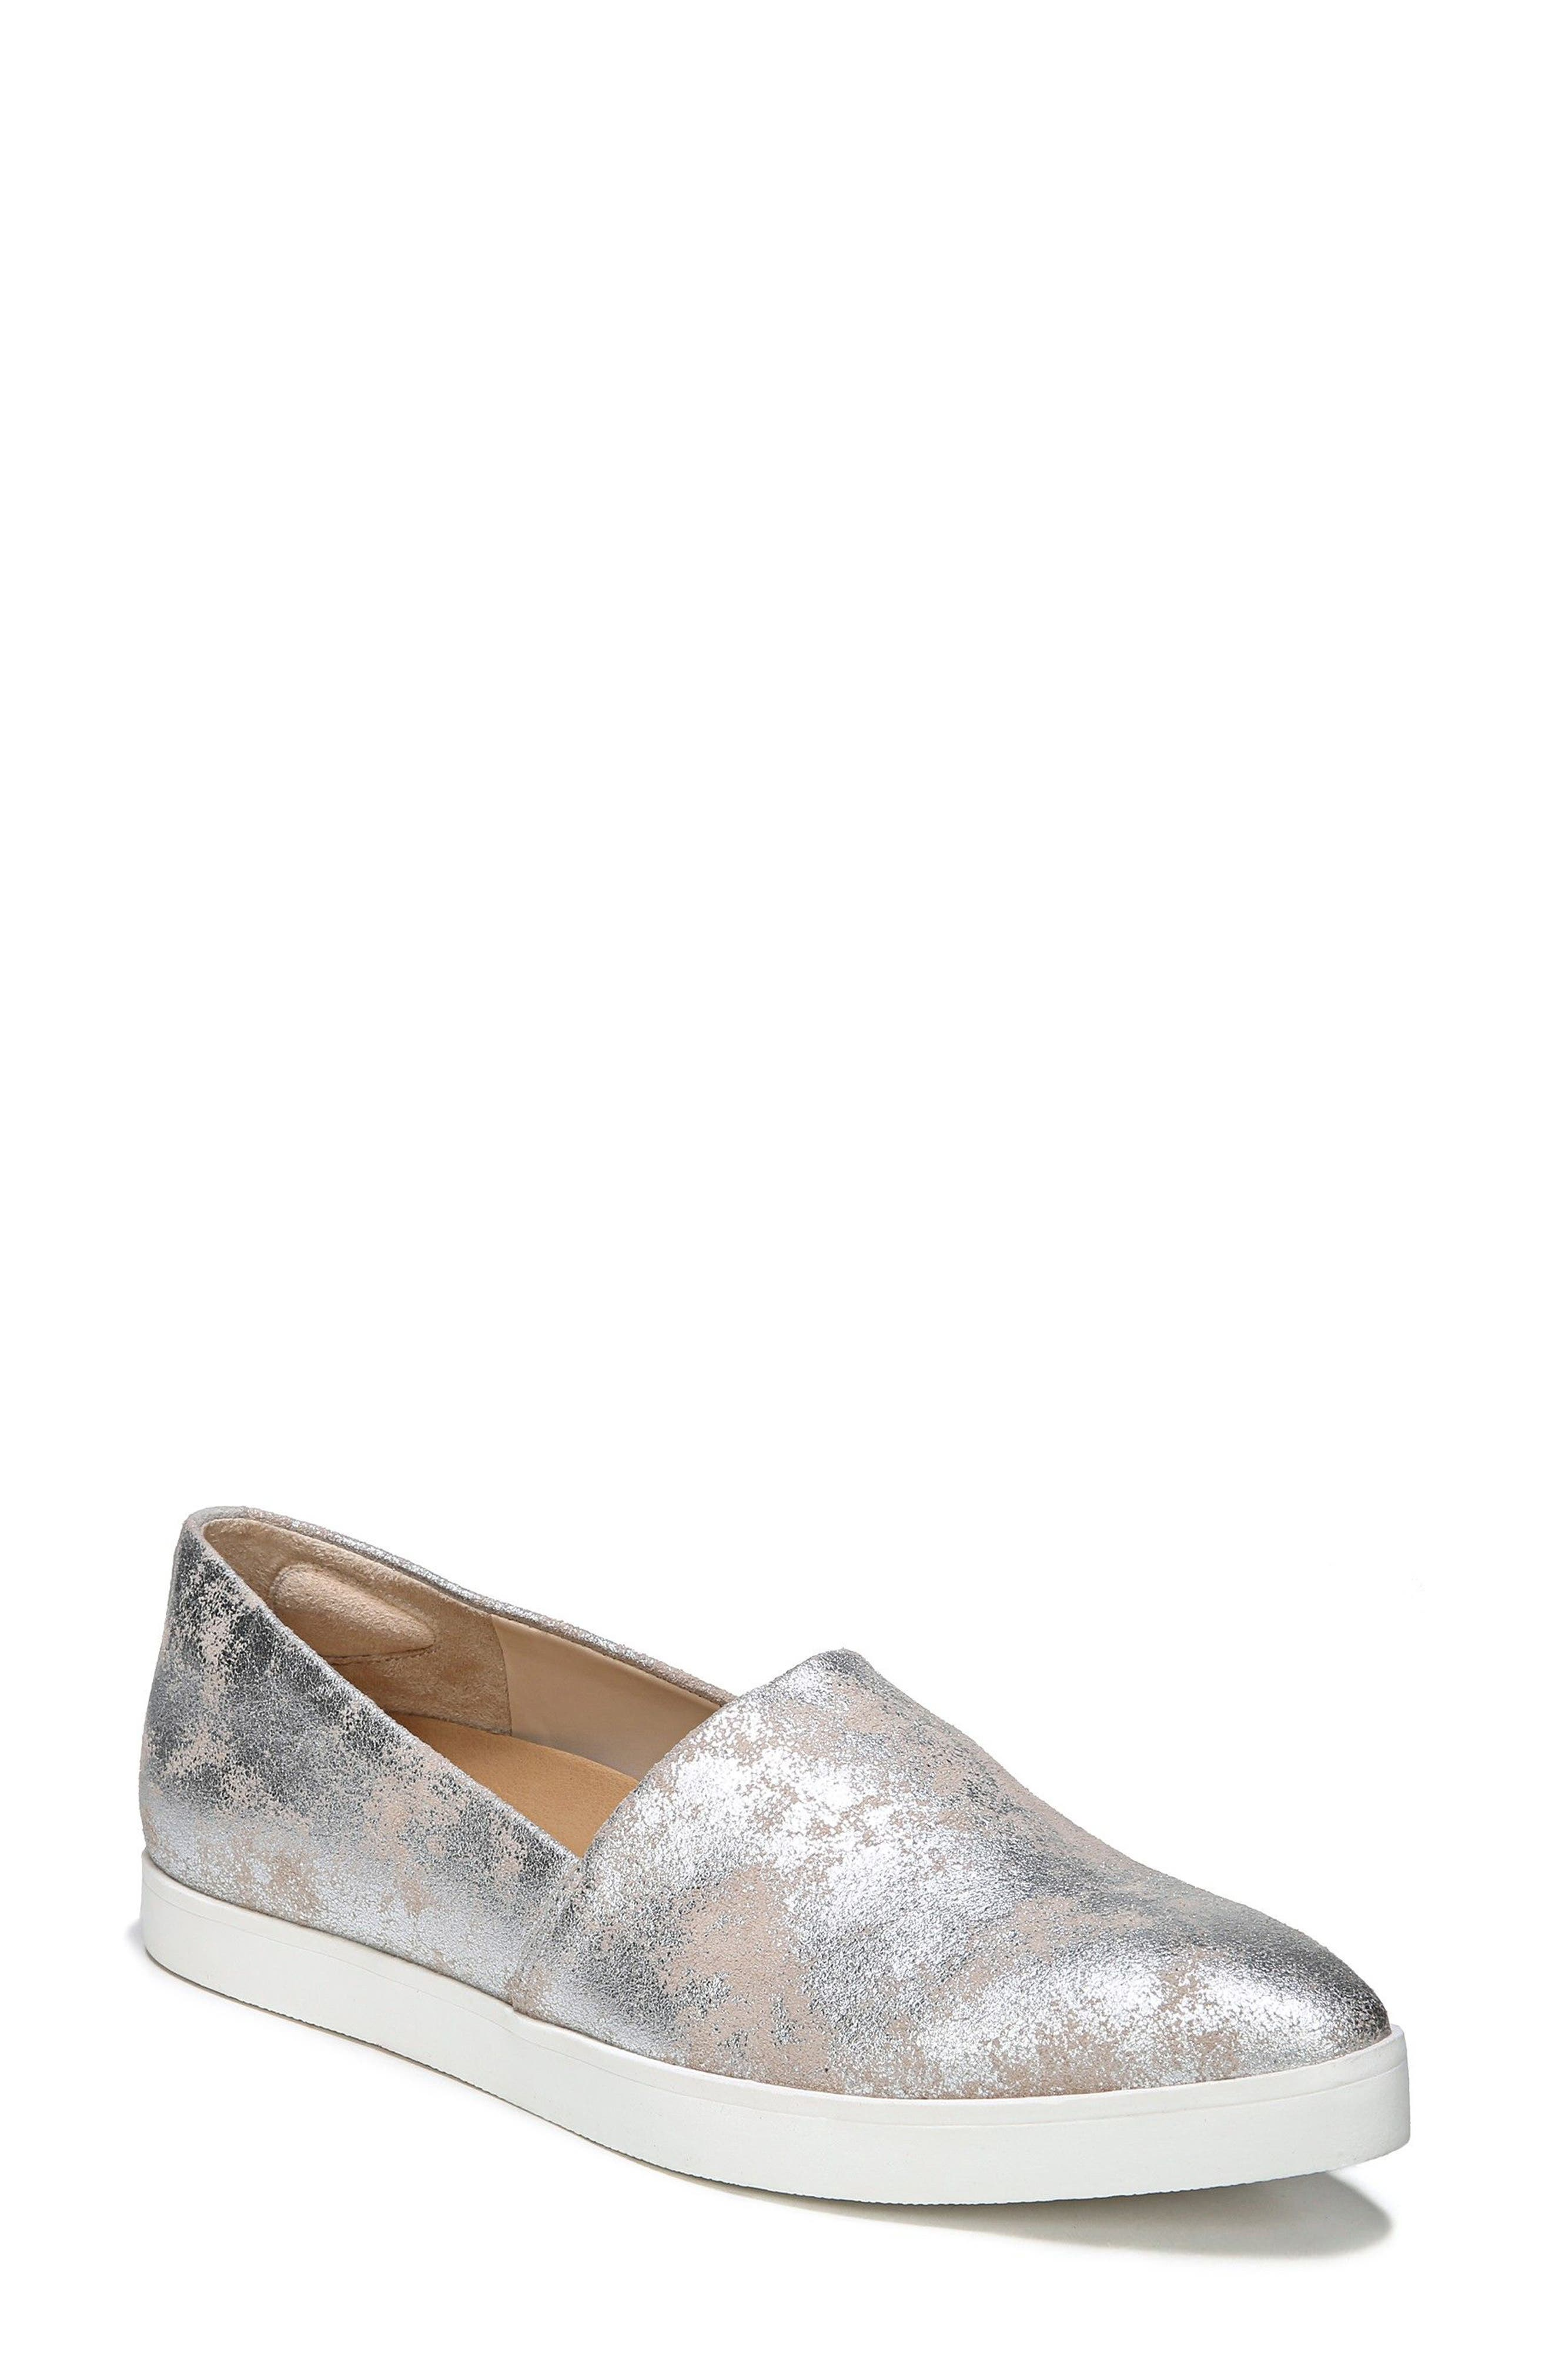 'Vienna' Slip-on Sneaker,                             Main thumbnail 1, color,                             040